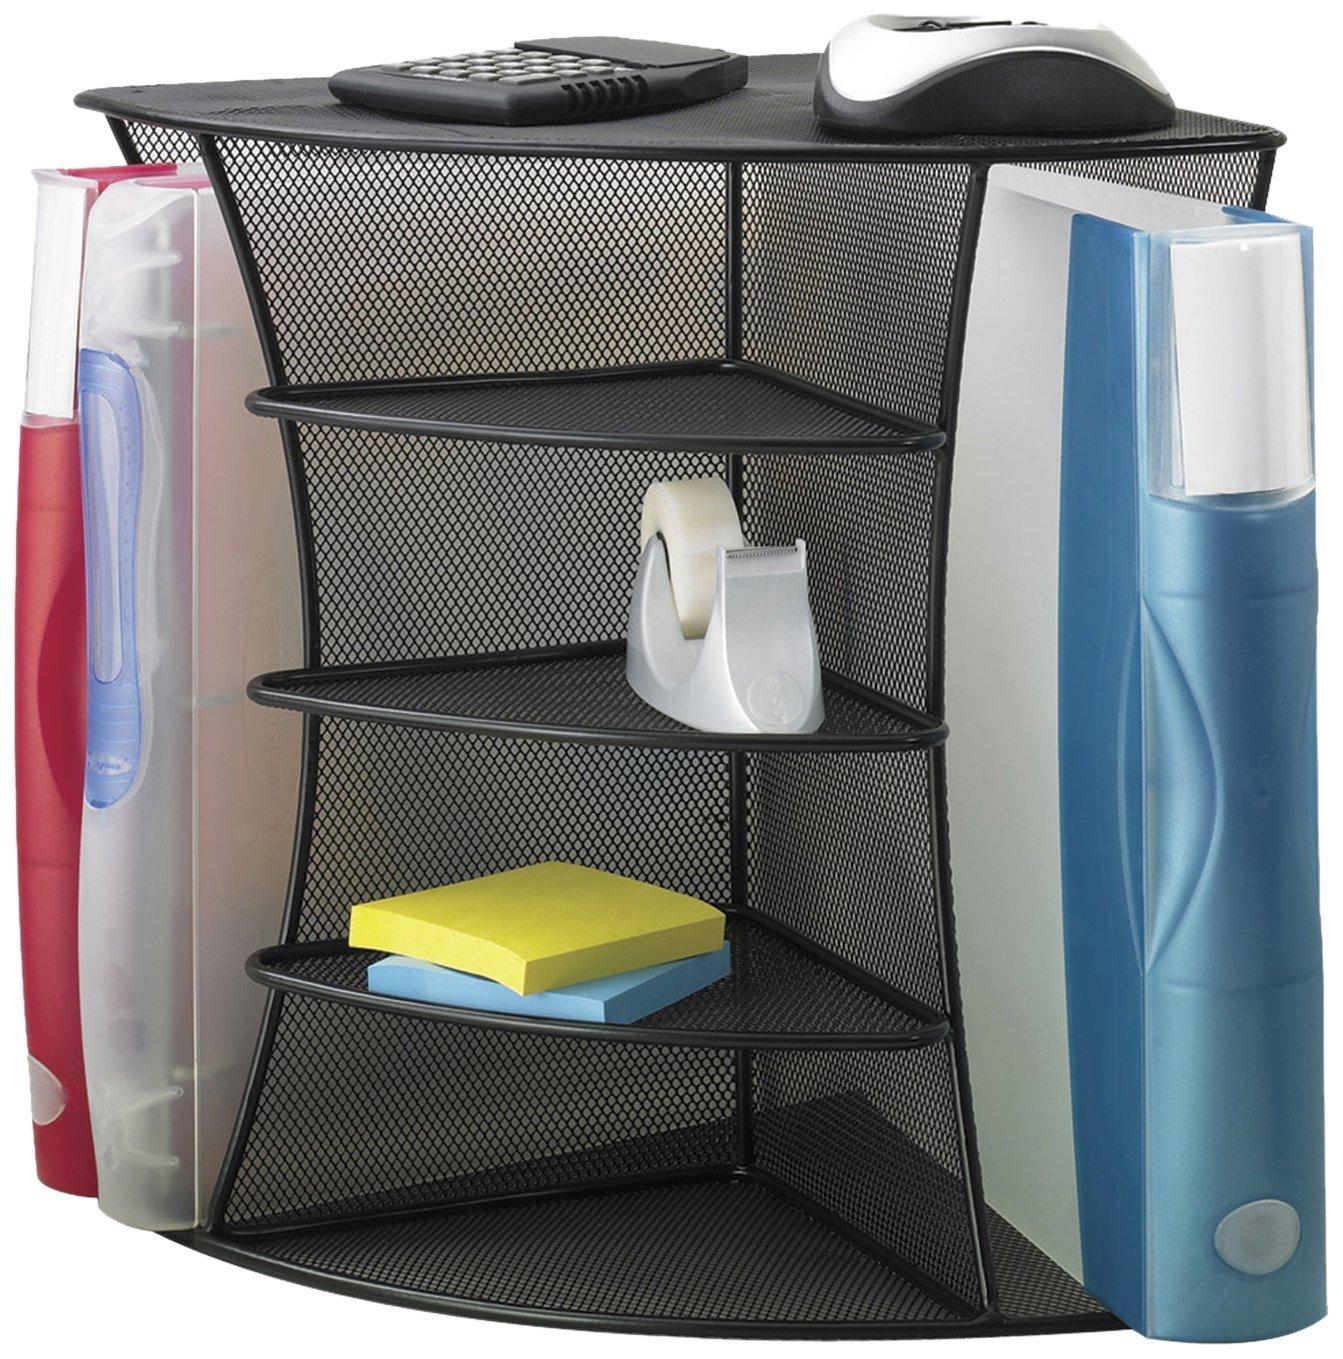 Safco Products 3261BL Onyx Mesh Desktop Corner Organizer, Black (4 Organizers)